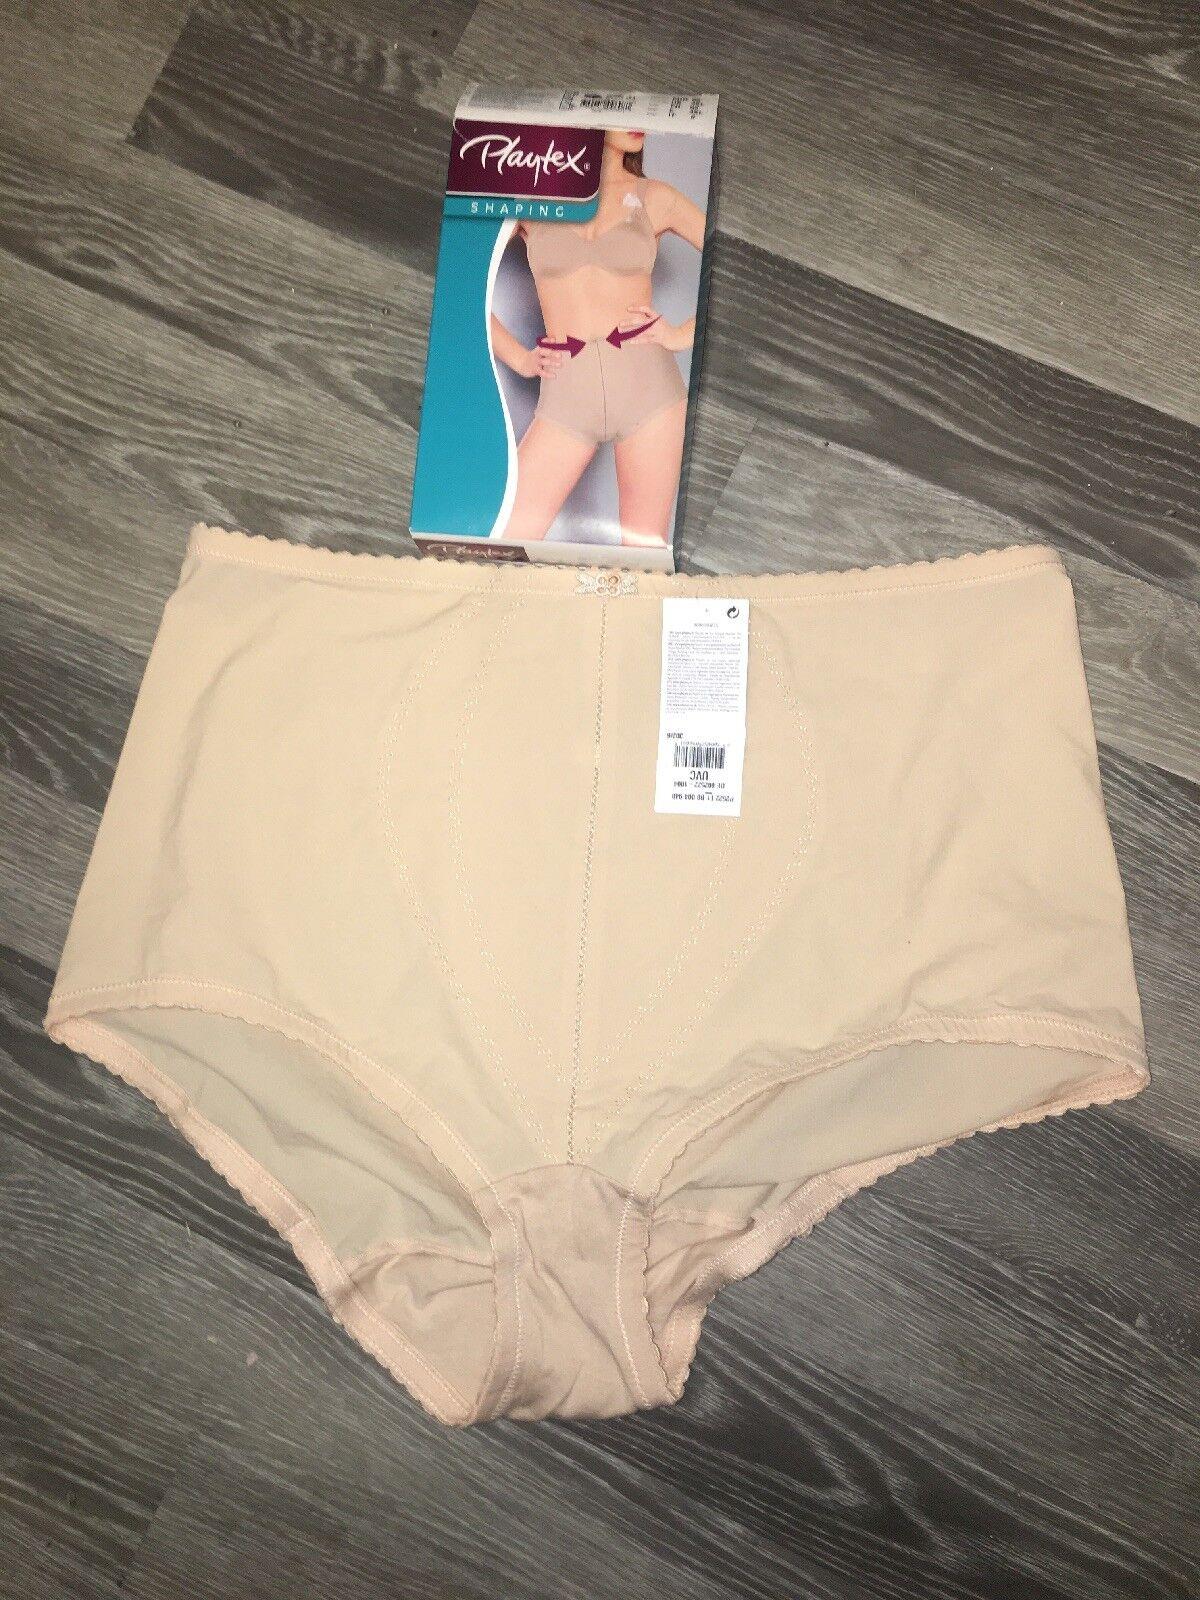 Ladies Playtex Shapewear P2522 New Boxed Skin Colour Beige Neutral Colour  XXXL